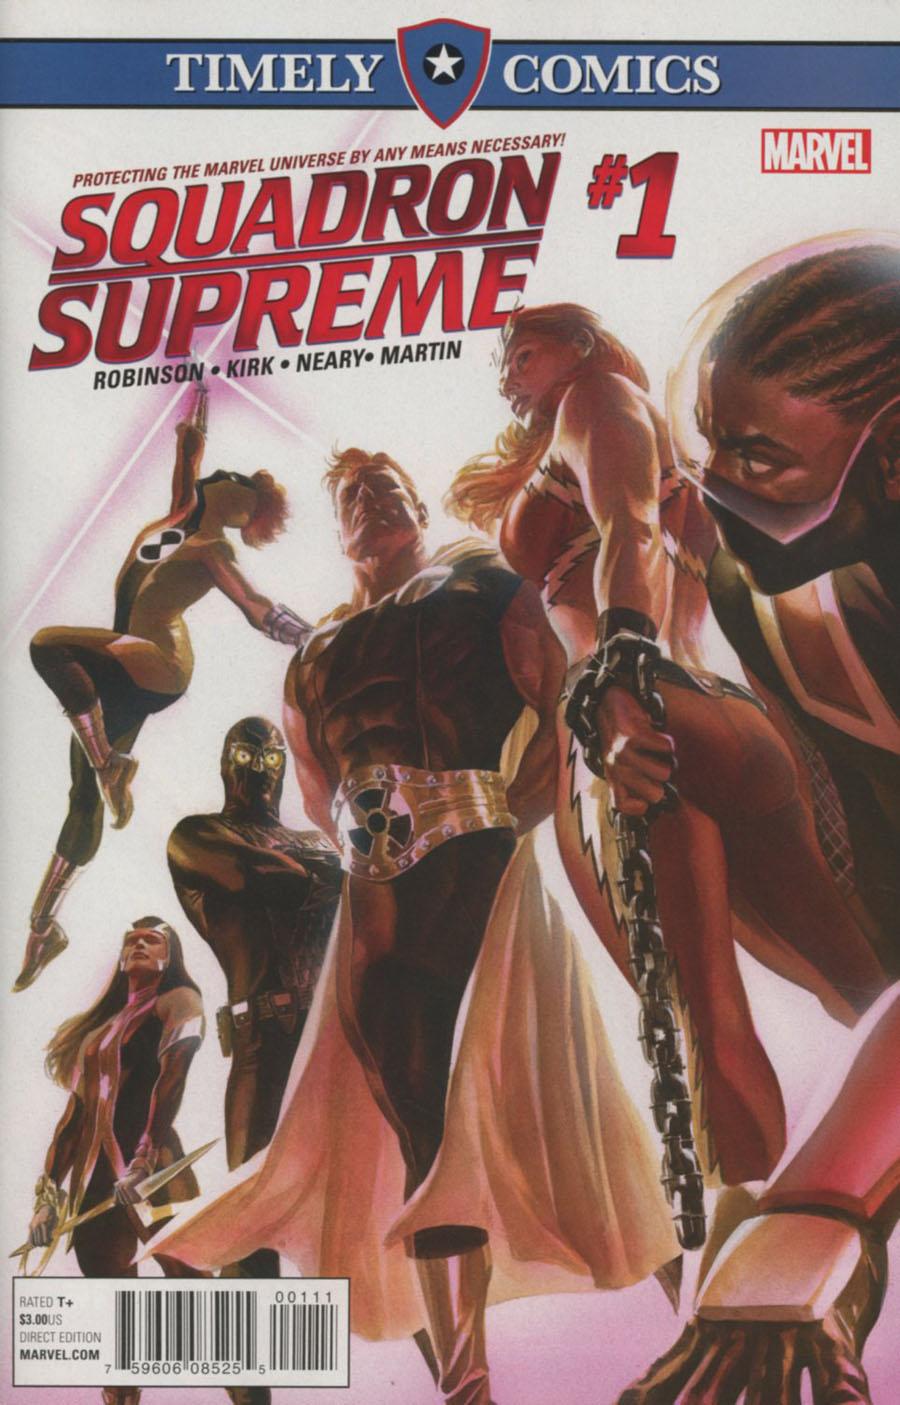 Timely Comics Squadron Supreme Vol 4 #1